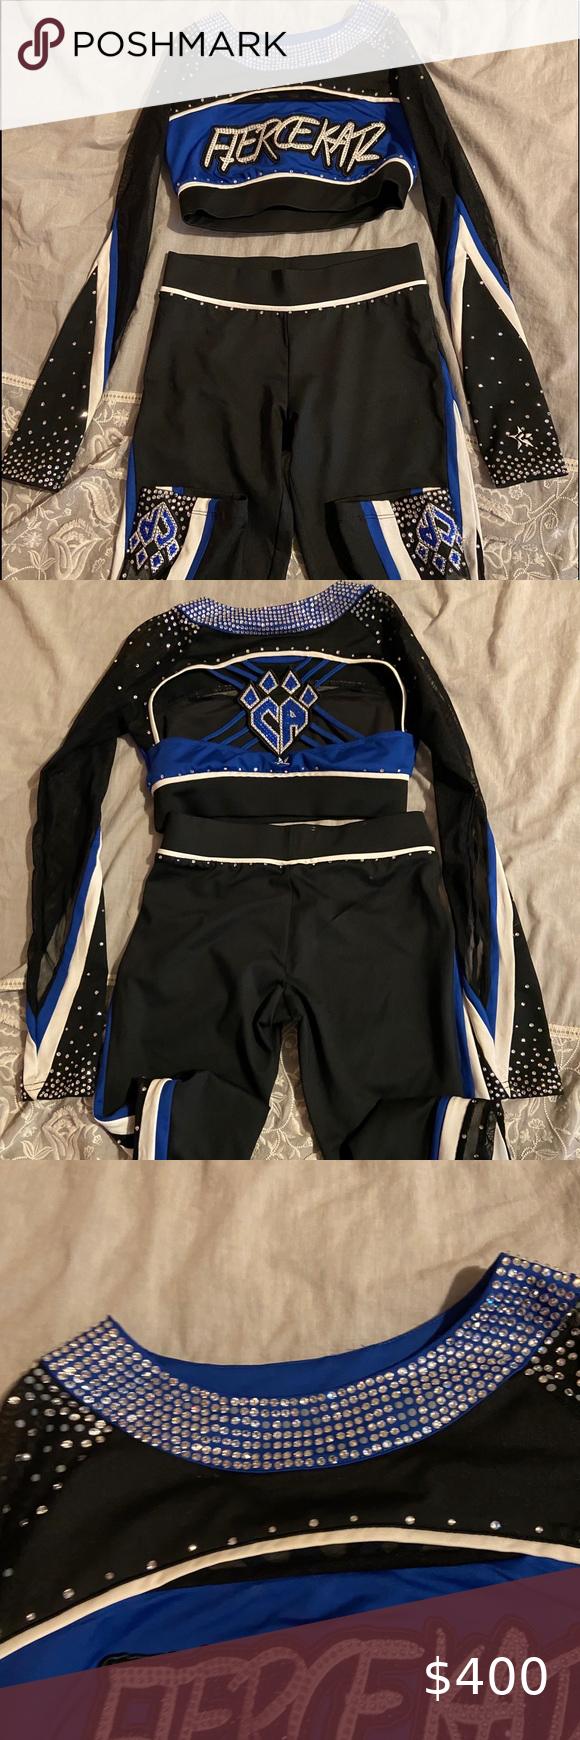 Cheer athletics cheer uniform